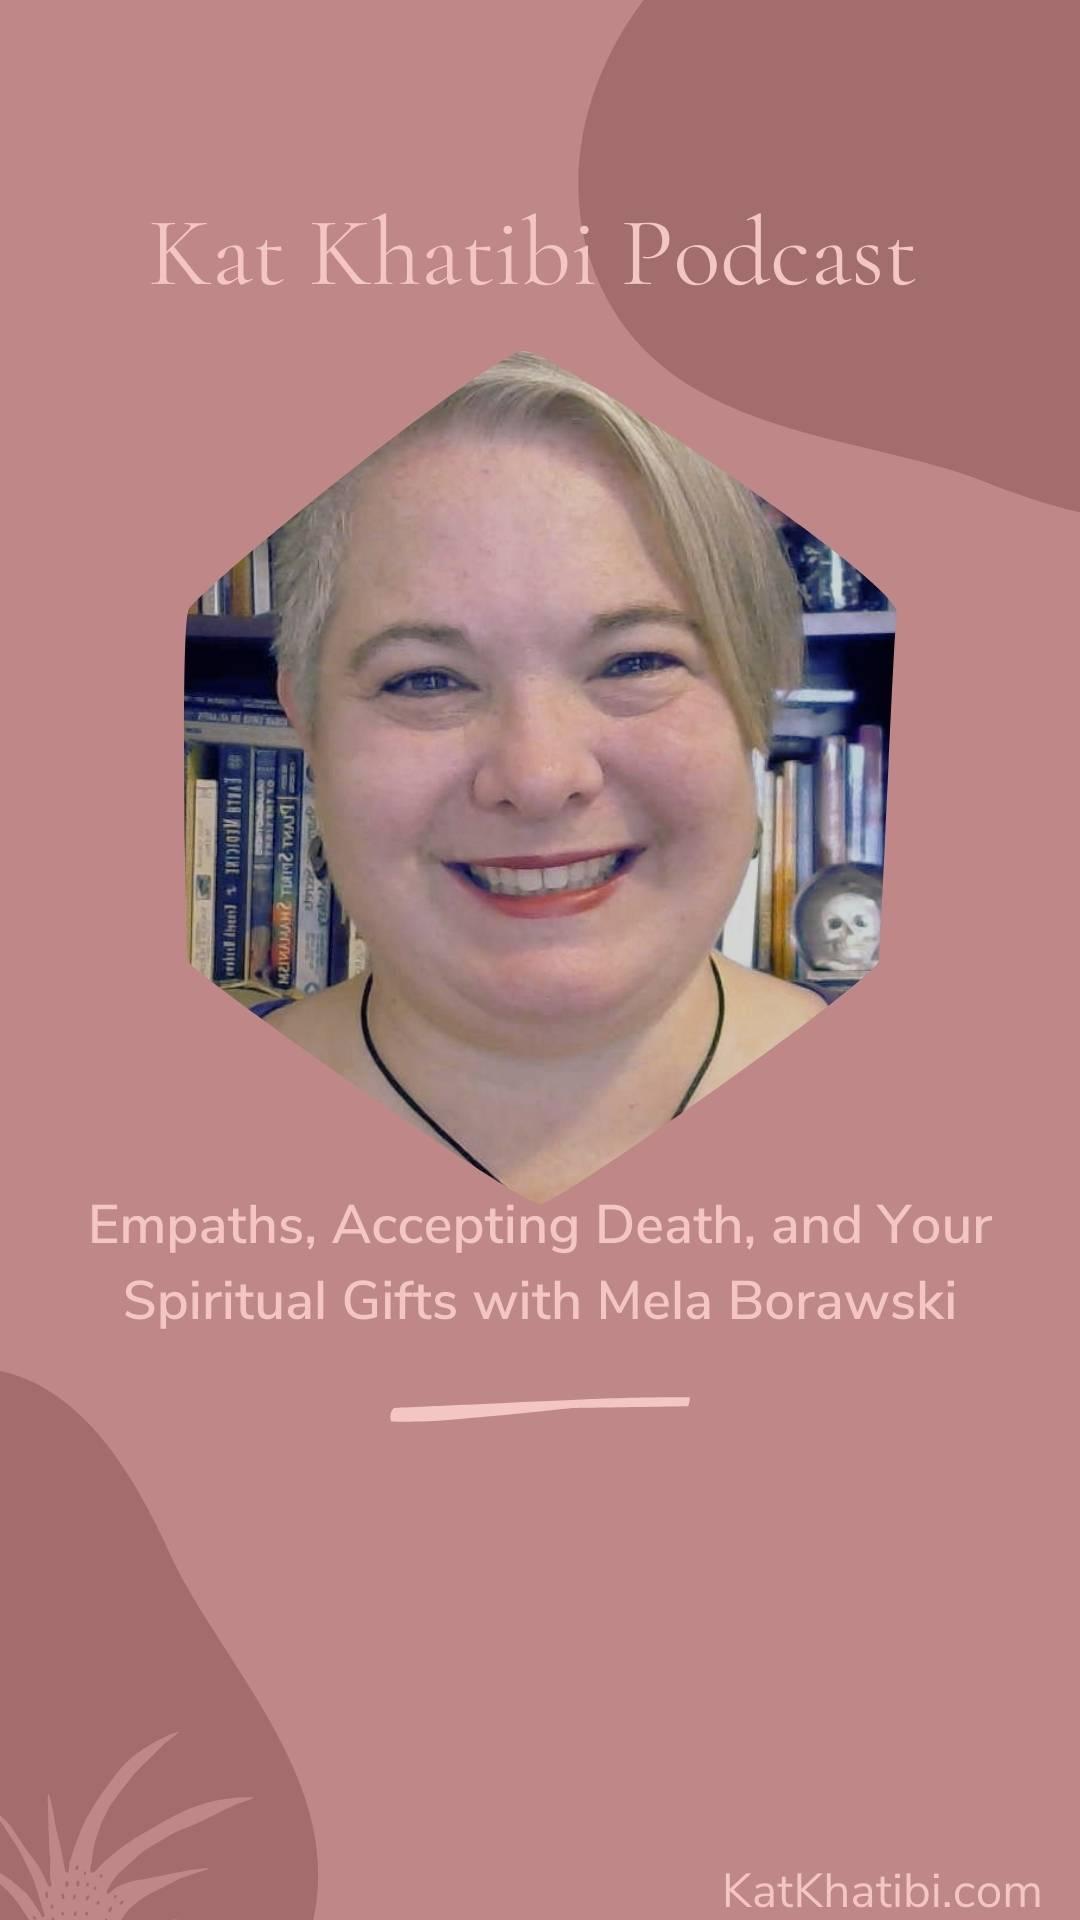 Empaths, Accepting Death, and Your Spiritual Gifts with Mela Borawski Kat Khatibi Podcast